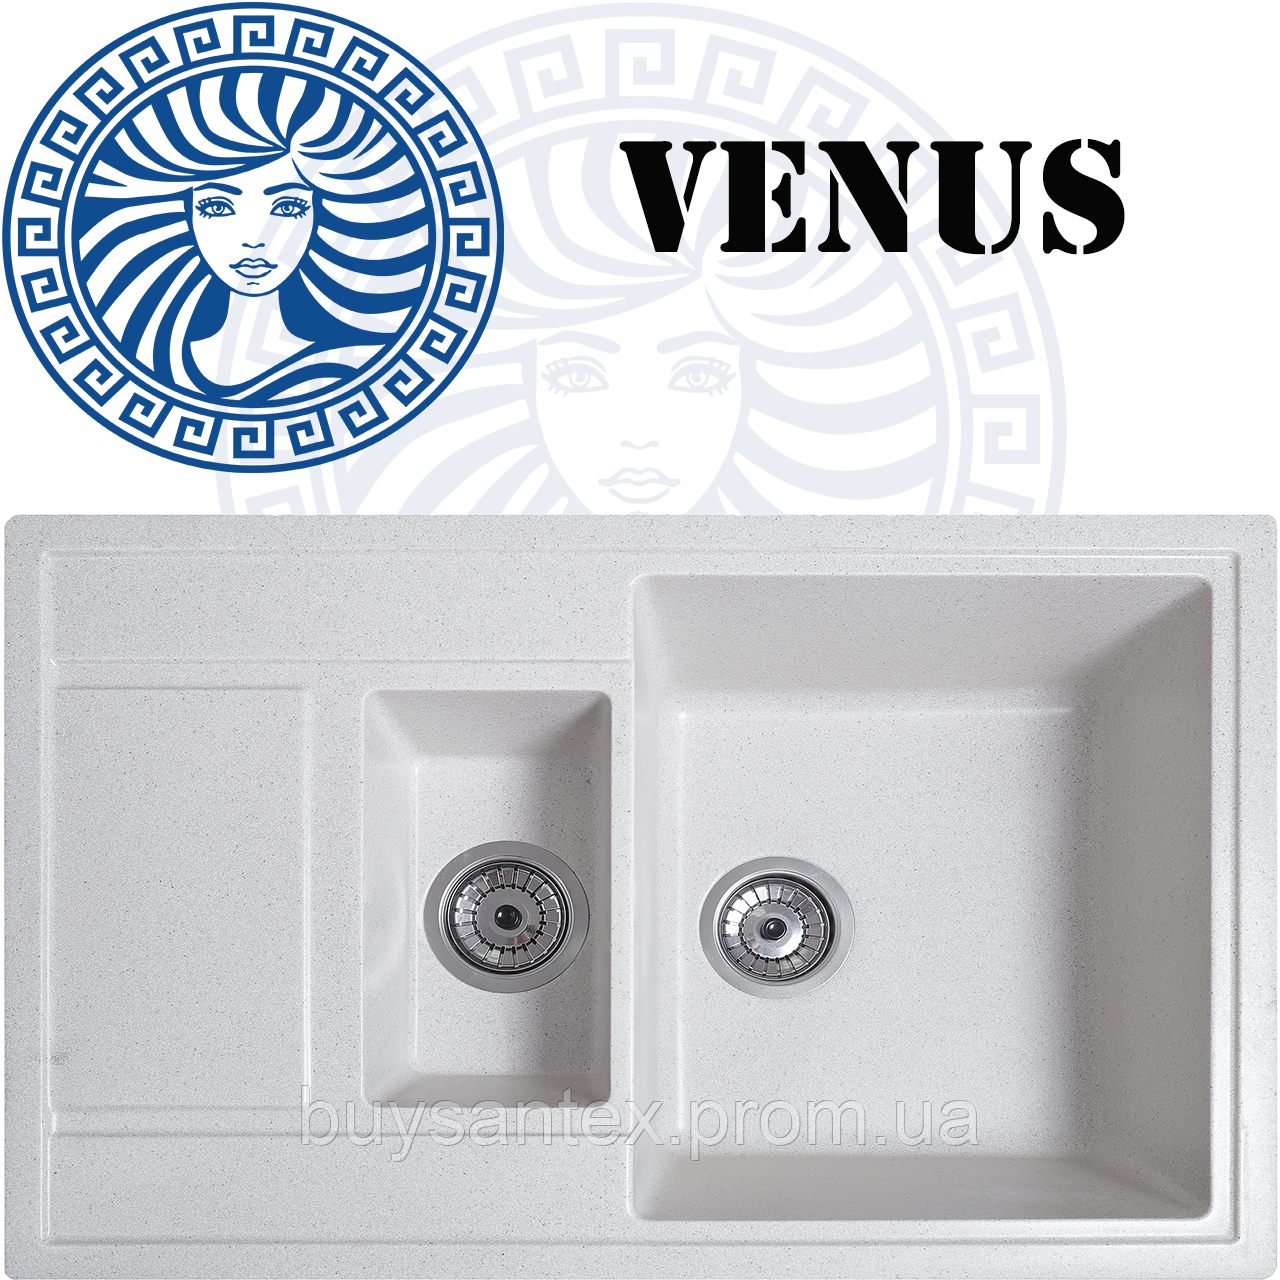 Кухонная мойка Cora - Venus Ivory